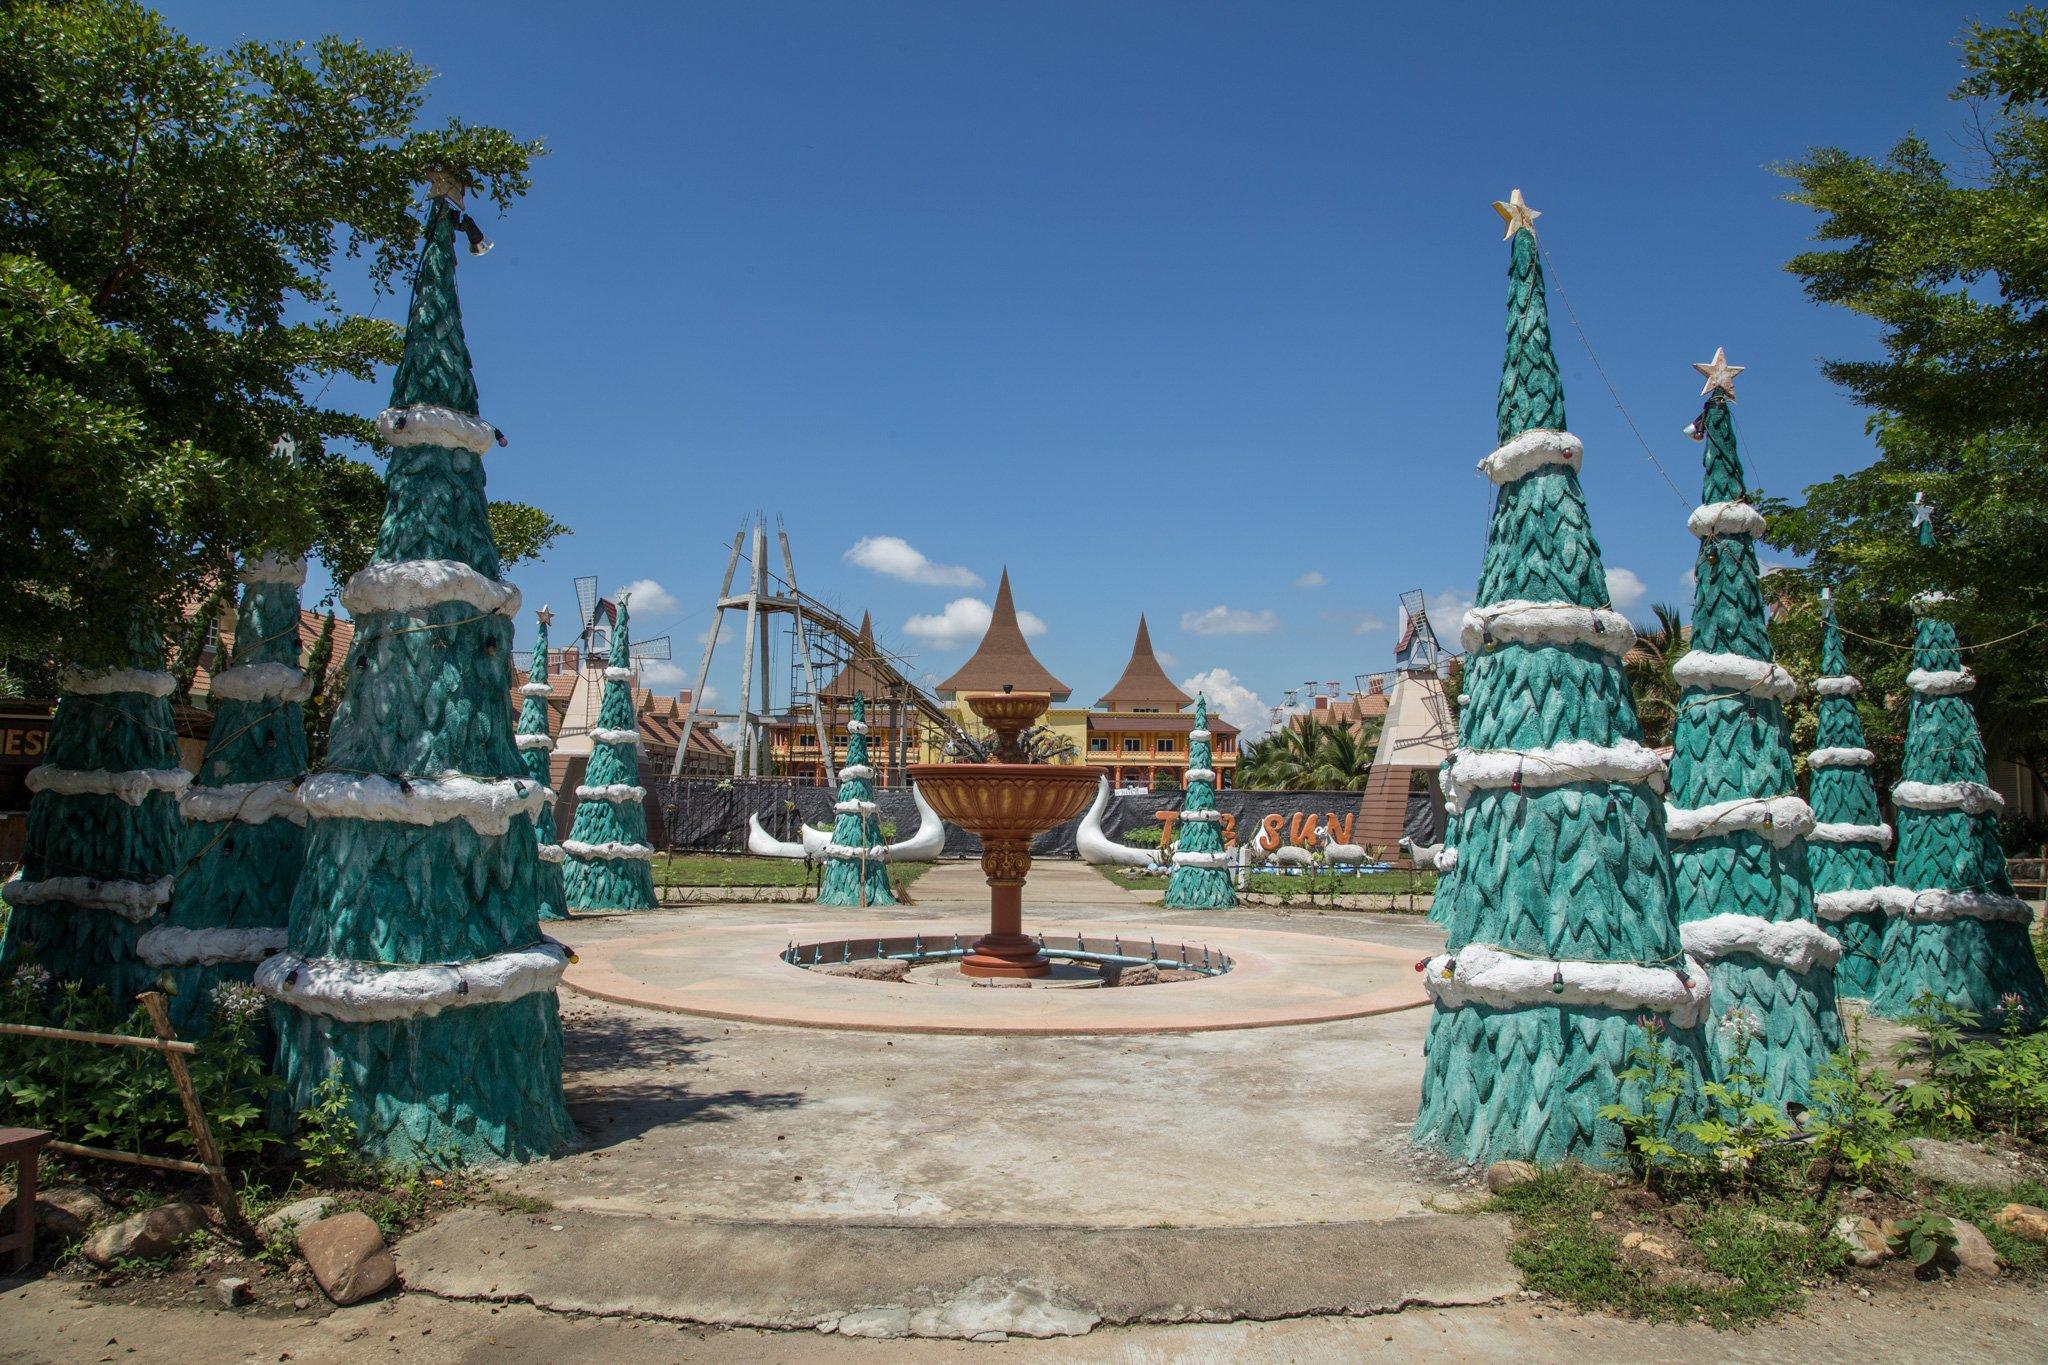 The Sun Water Theme Park